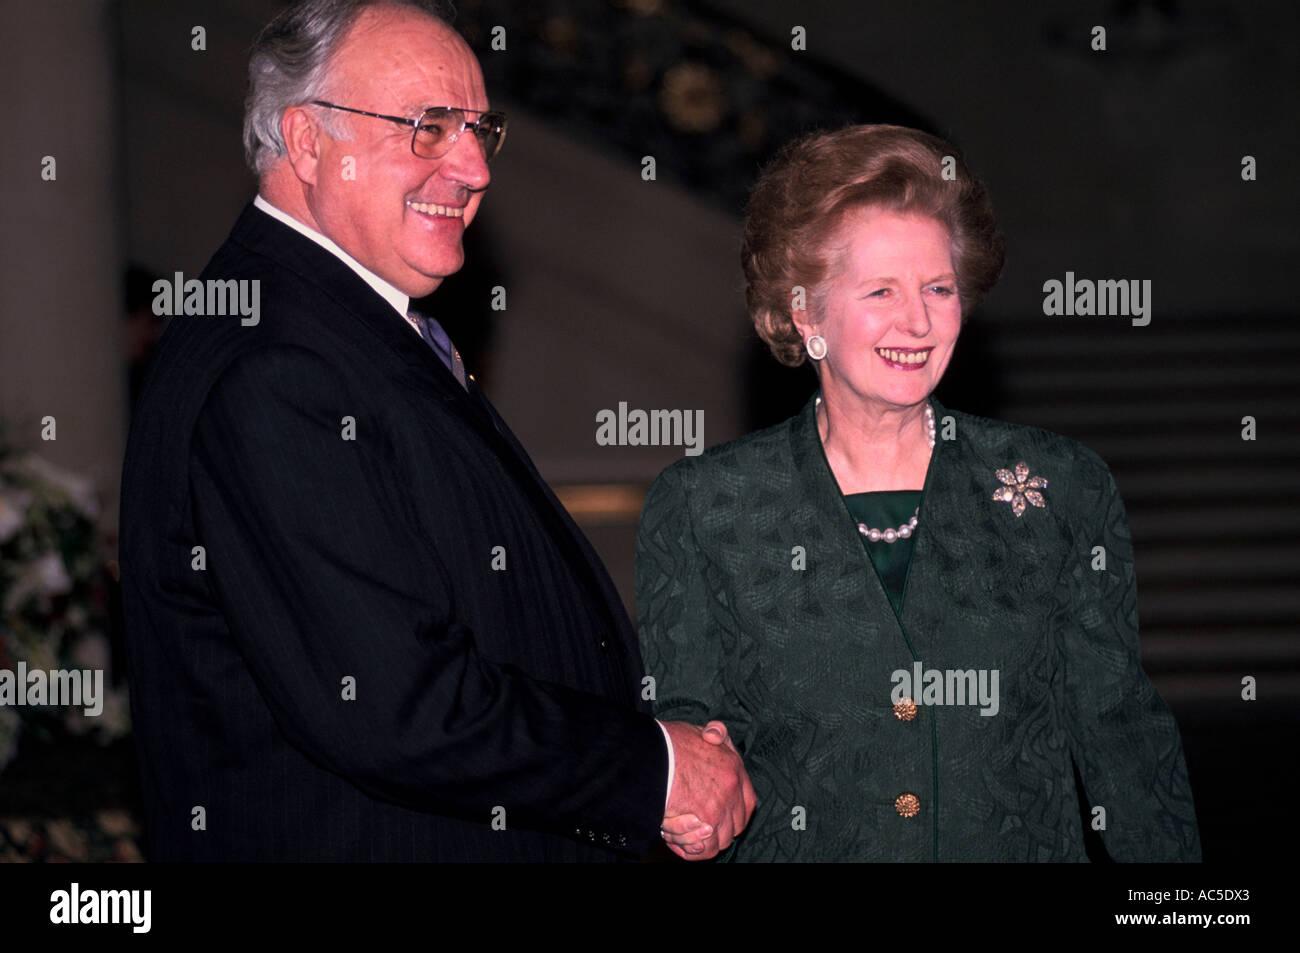 MARGARET THATCHER AND HELMUT KOHL PARIS 1990 - Stock Image